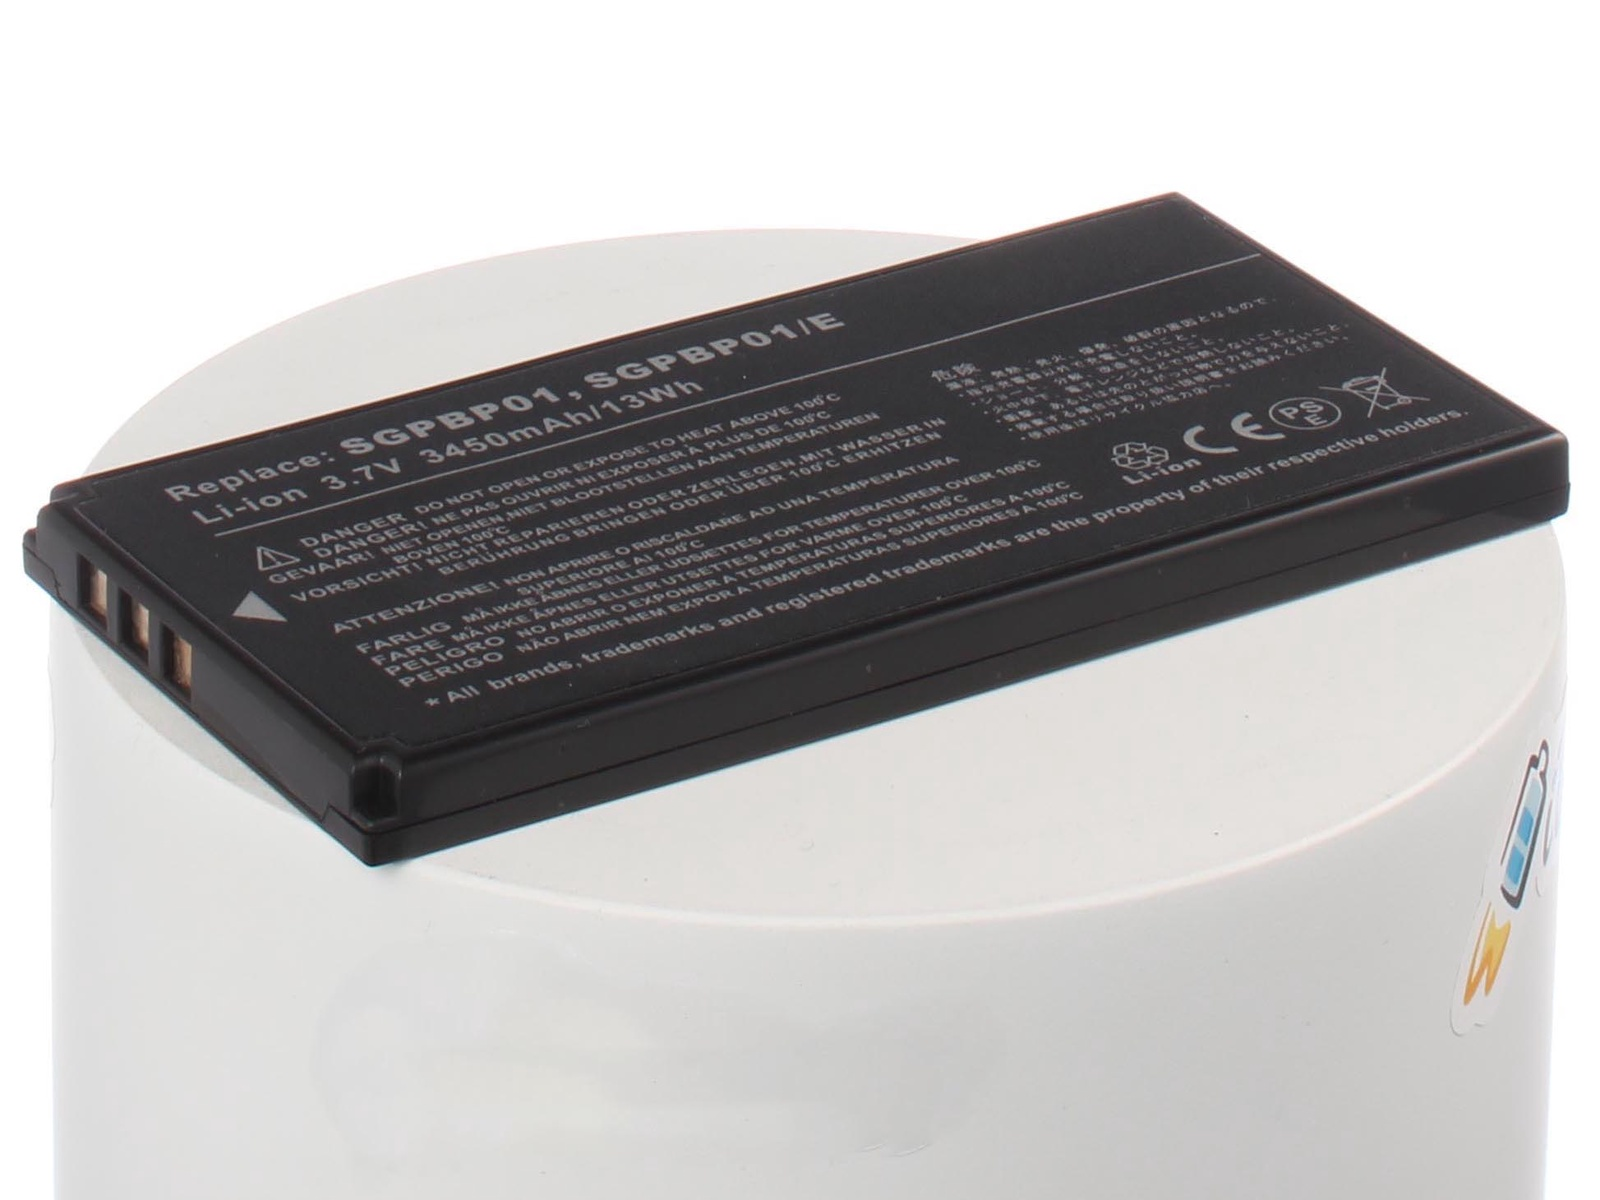 Аккумуляторная батарея iBatt iB-A1-A862 3080mAh для ноутбуков Sony комплектующие и запчасти для ноутбуков sony sve151c11t sve151c11m sve151d12t